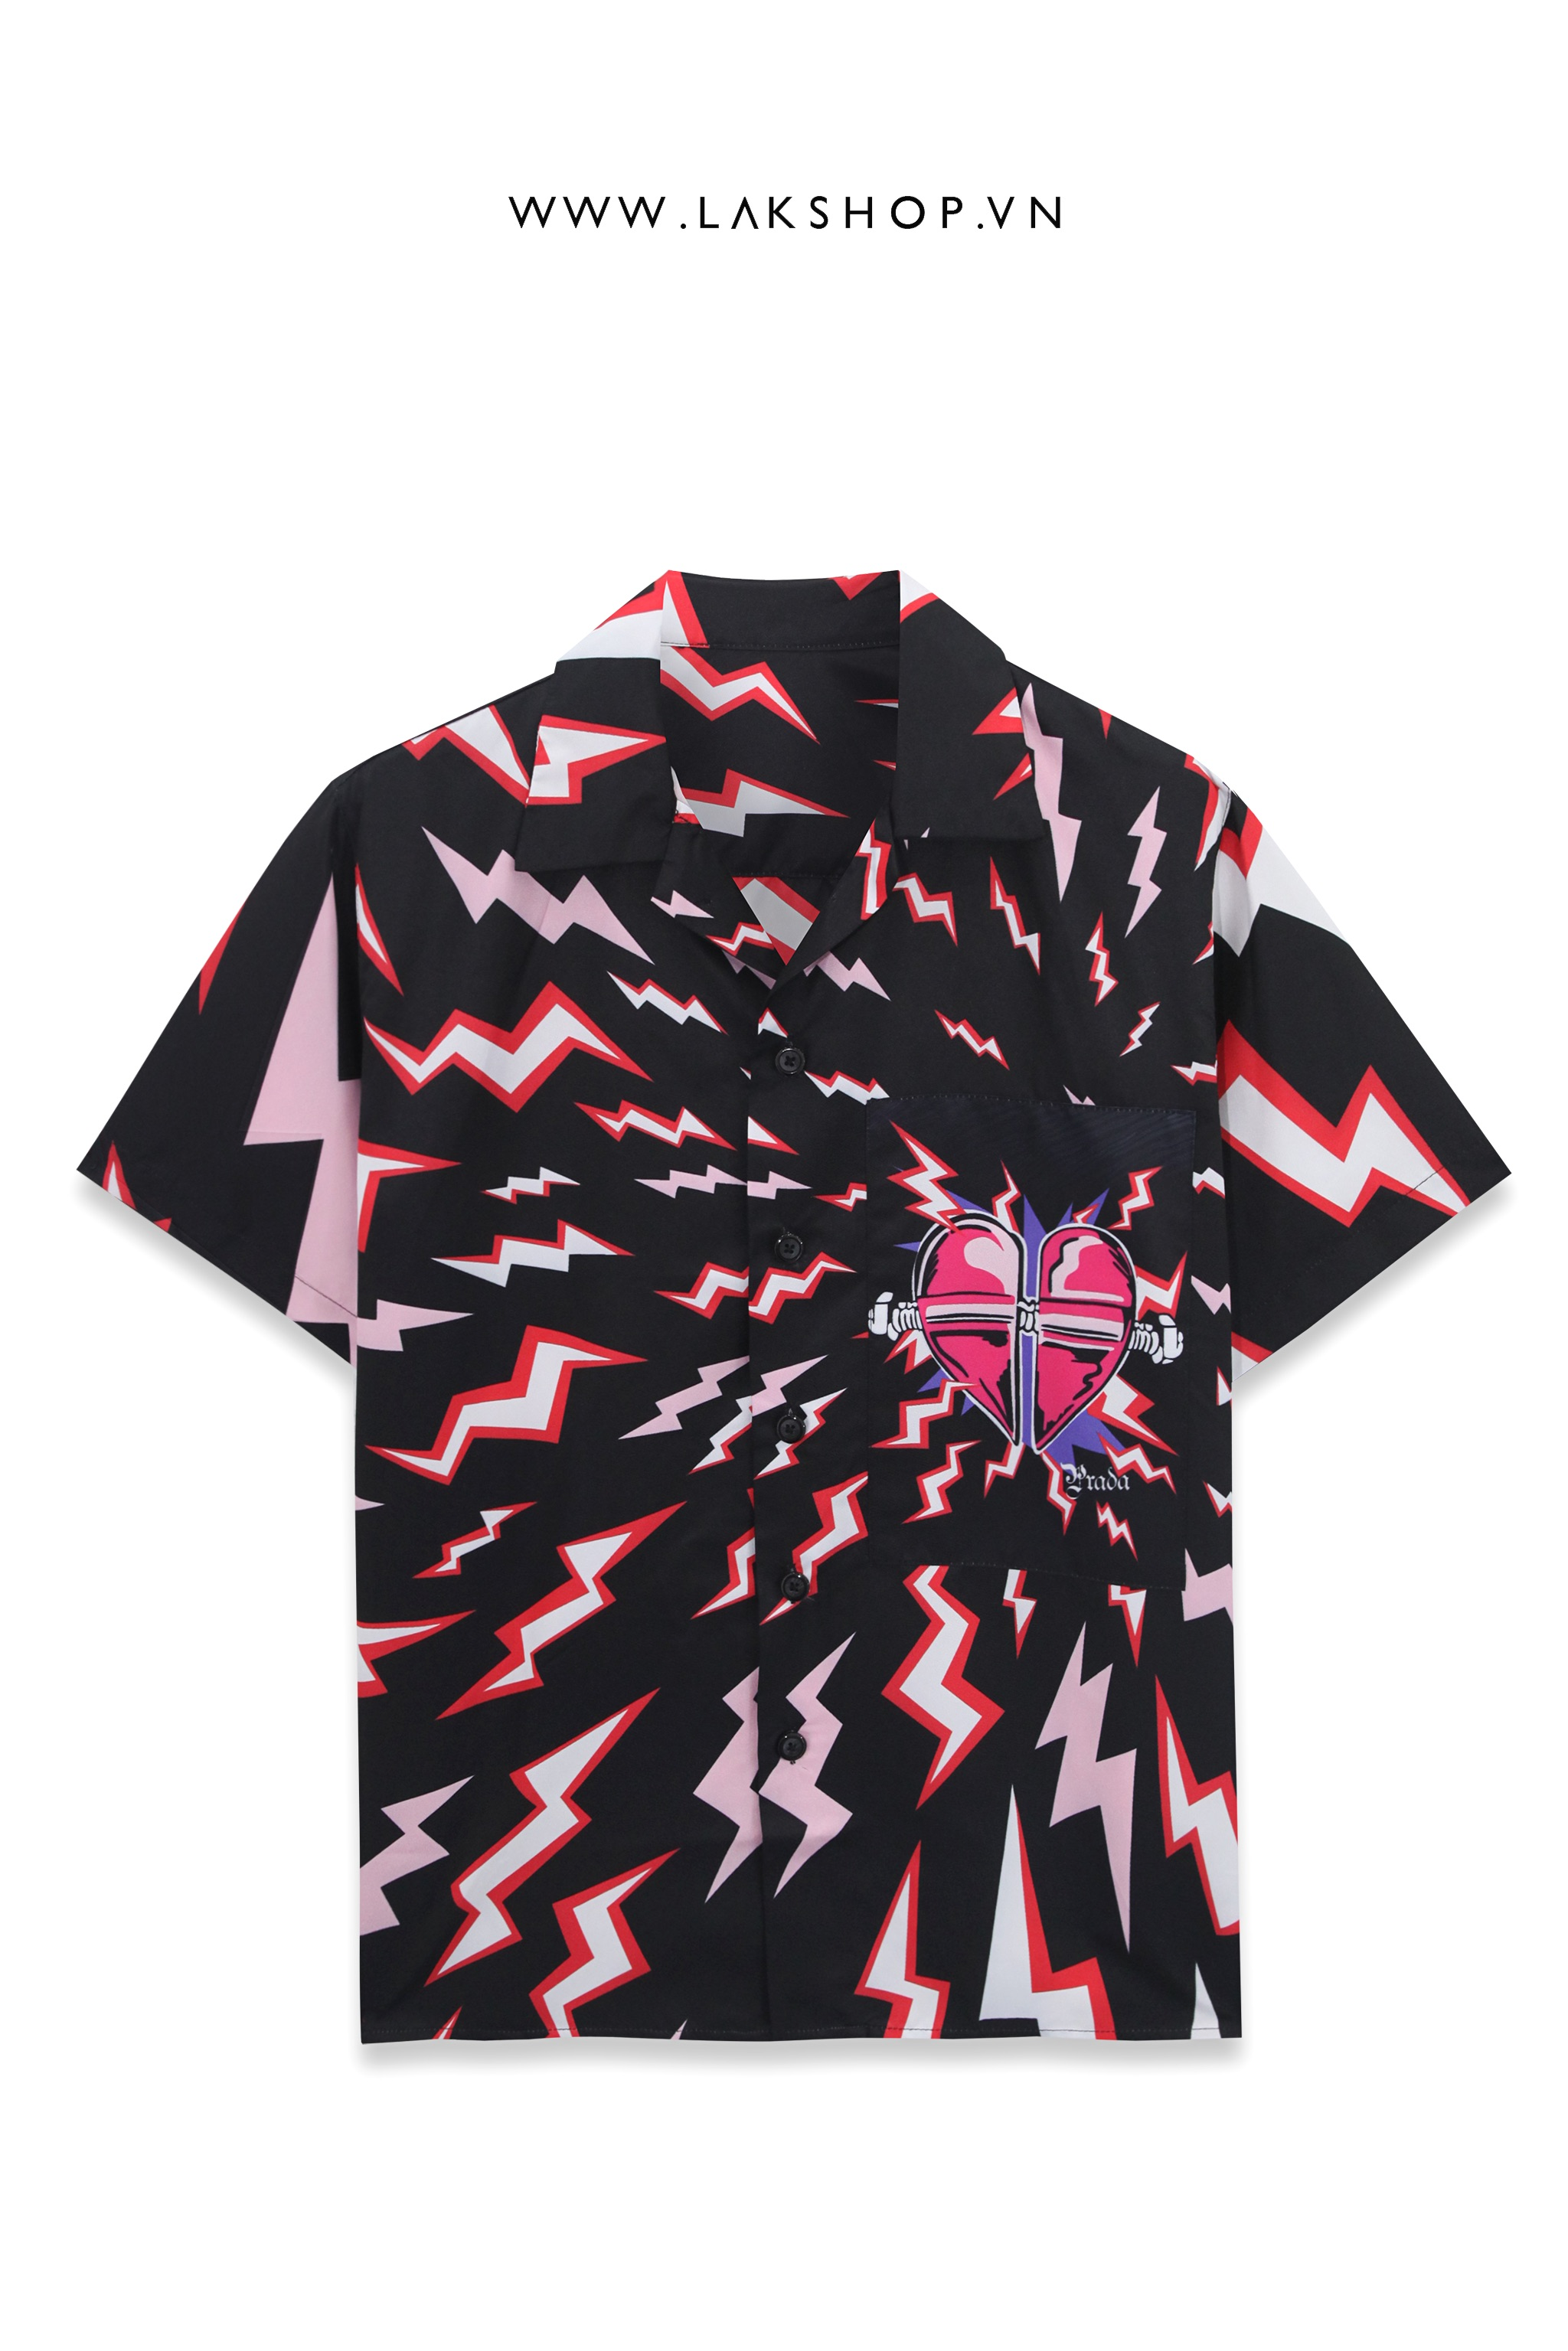 Prada Lightning Bolt Oversized Shirt